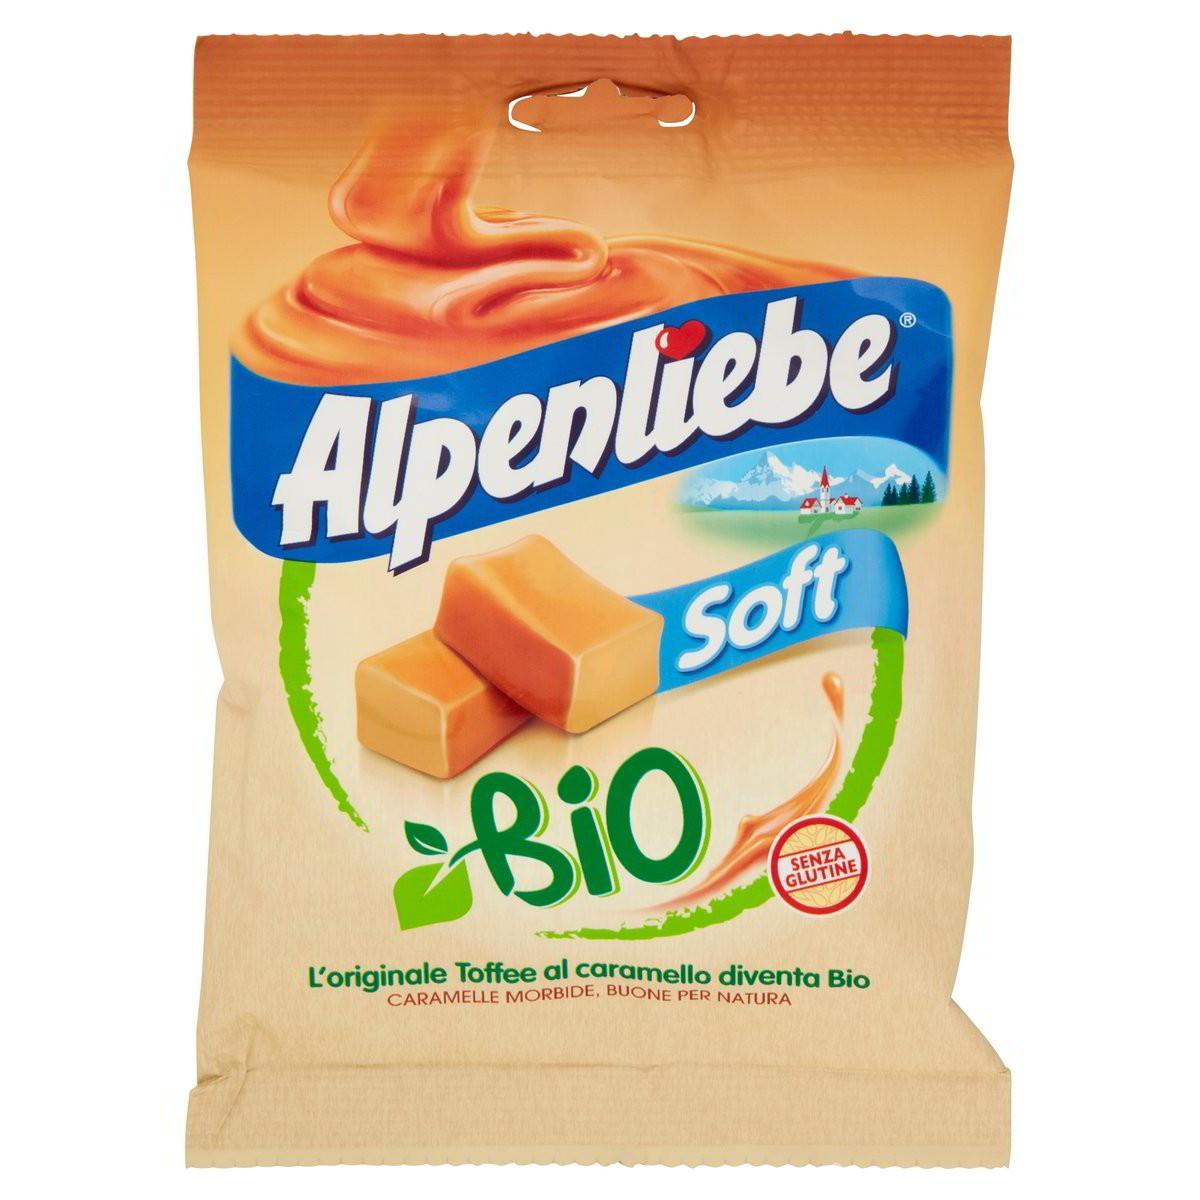 Toffee Al Caramello Soft